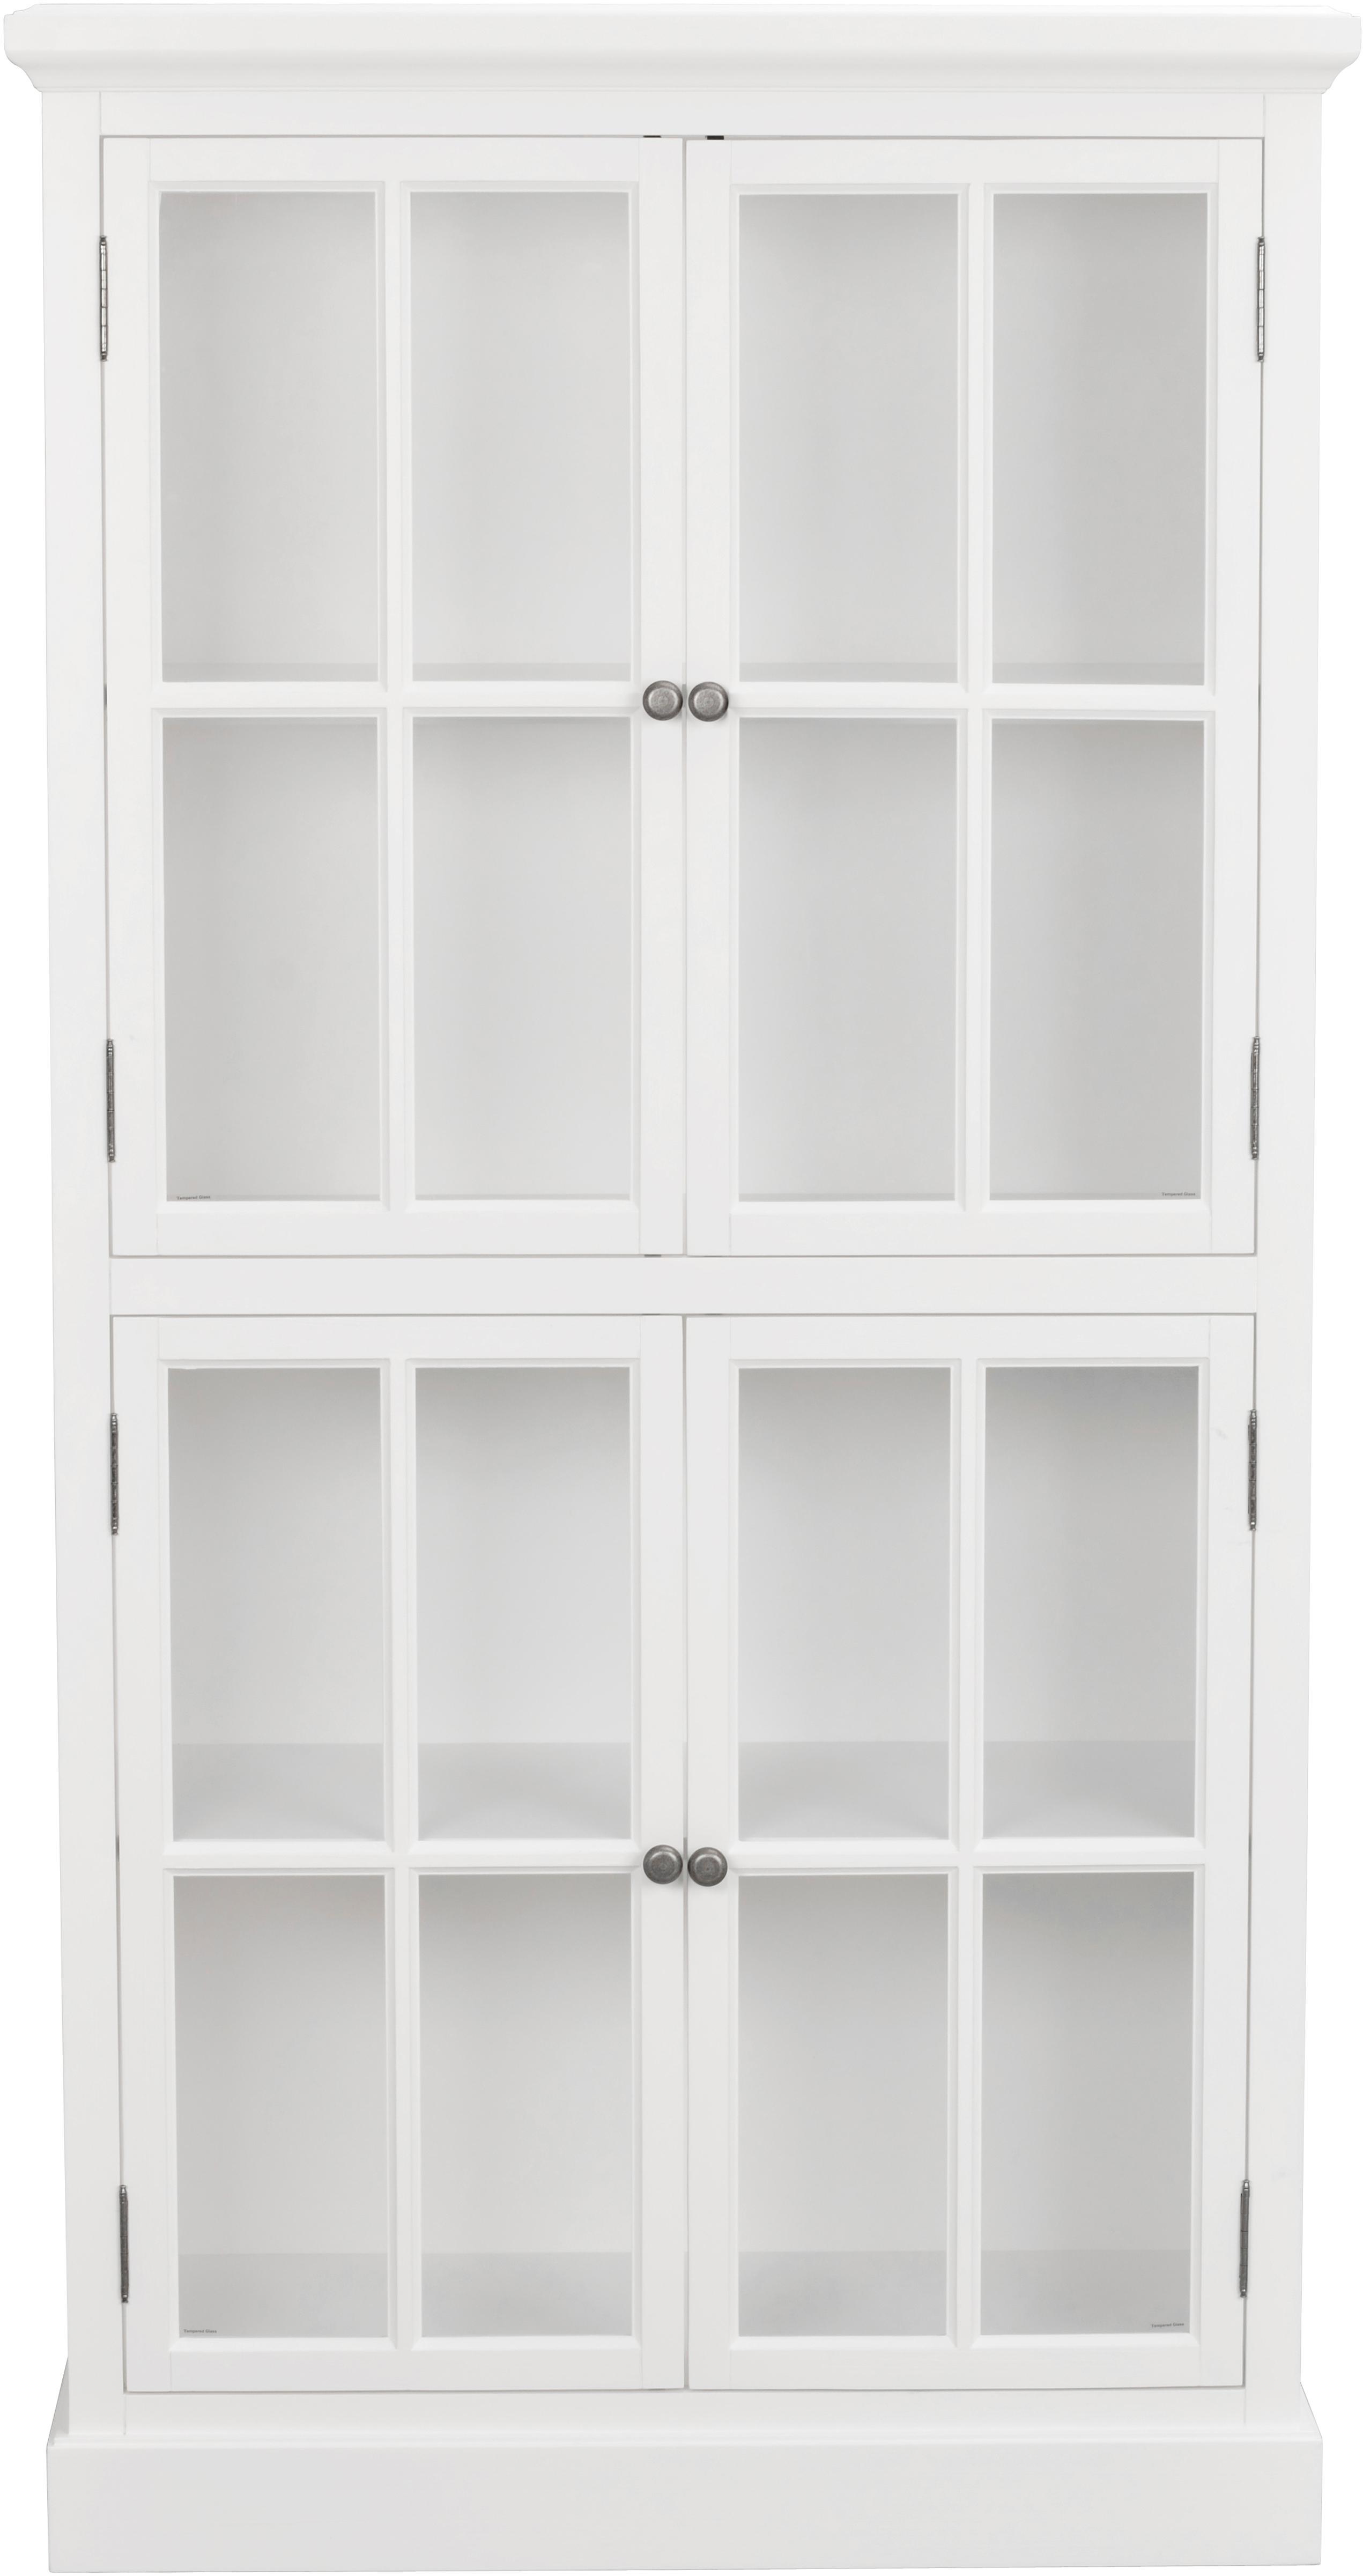 Vitrinekast Lorient in wit, Gelakt grenenhout, MDF, Wit, 95 x 185 cm